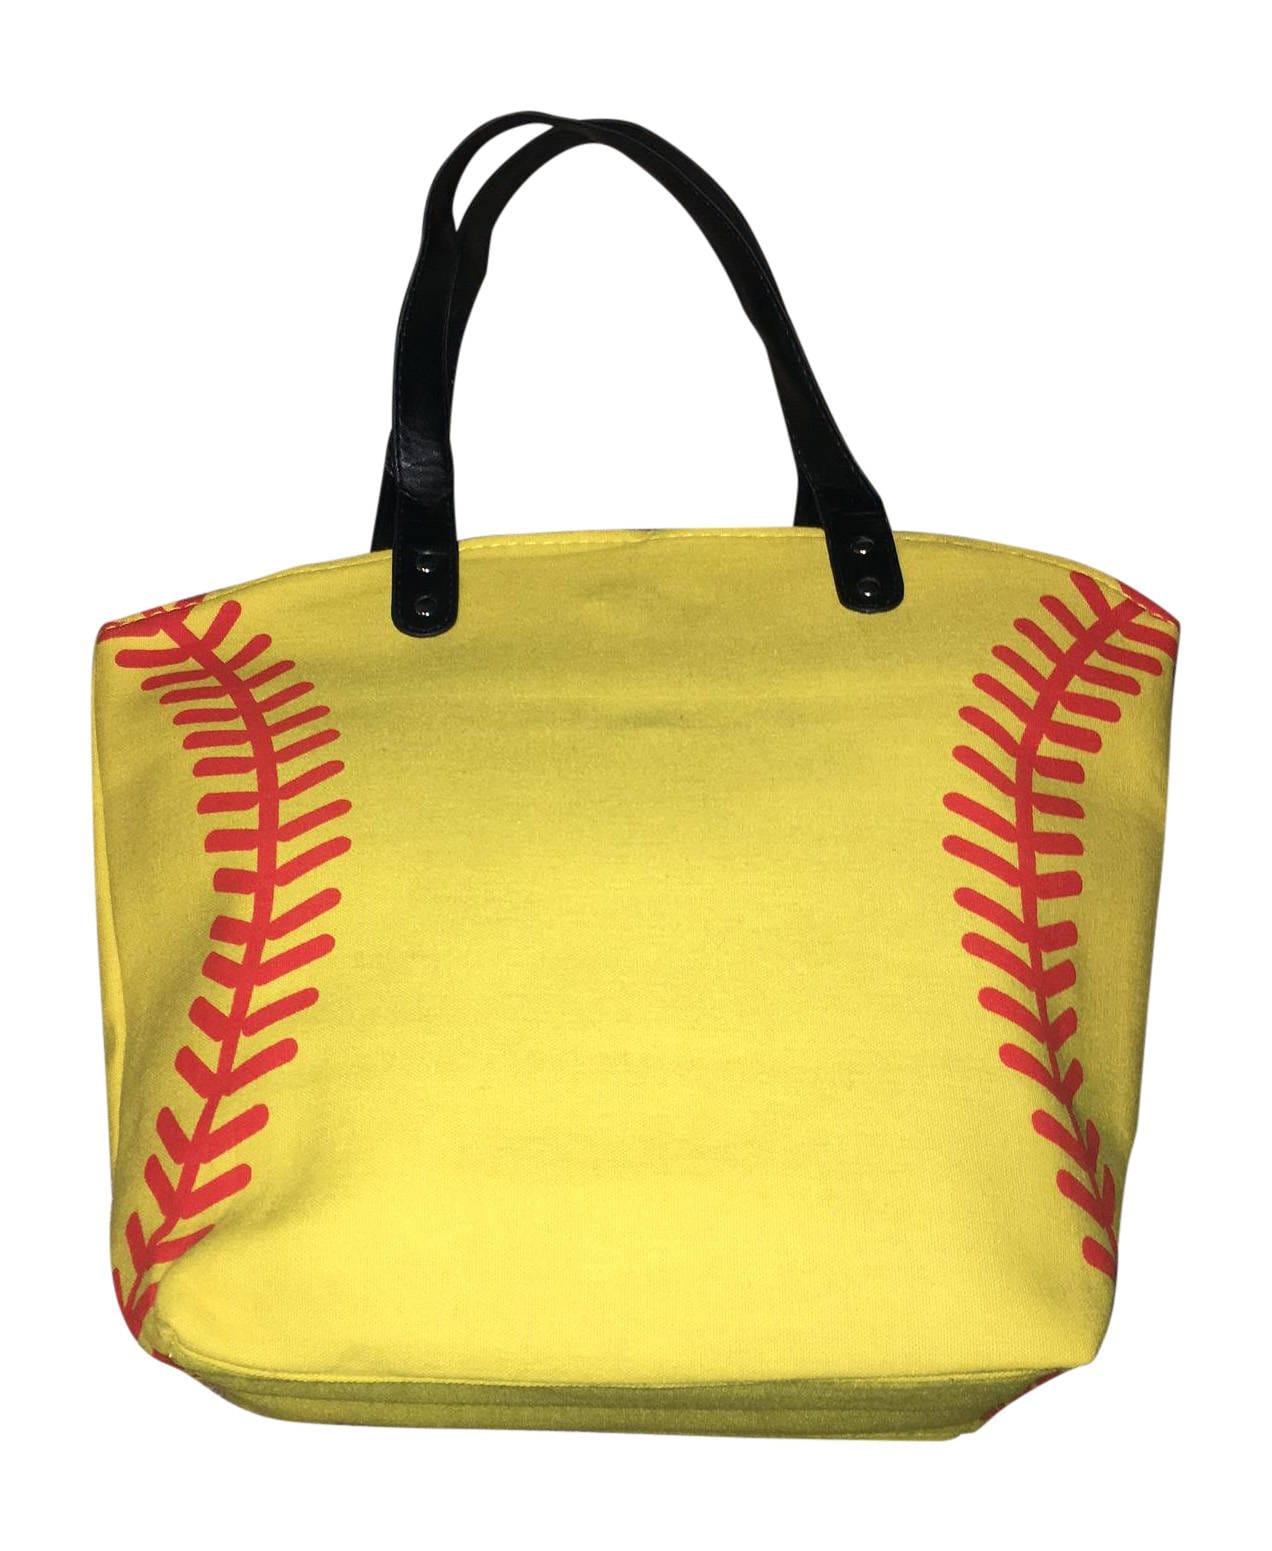 9db298063ccc Yellow Softball Canvas Tote Bag